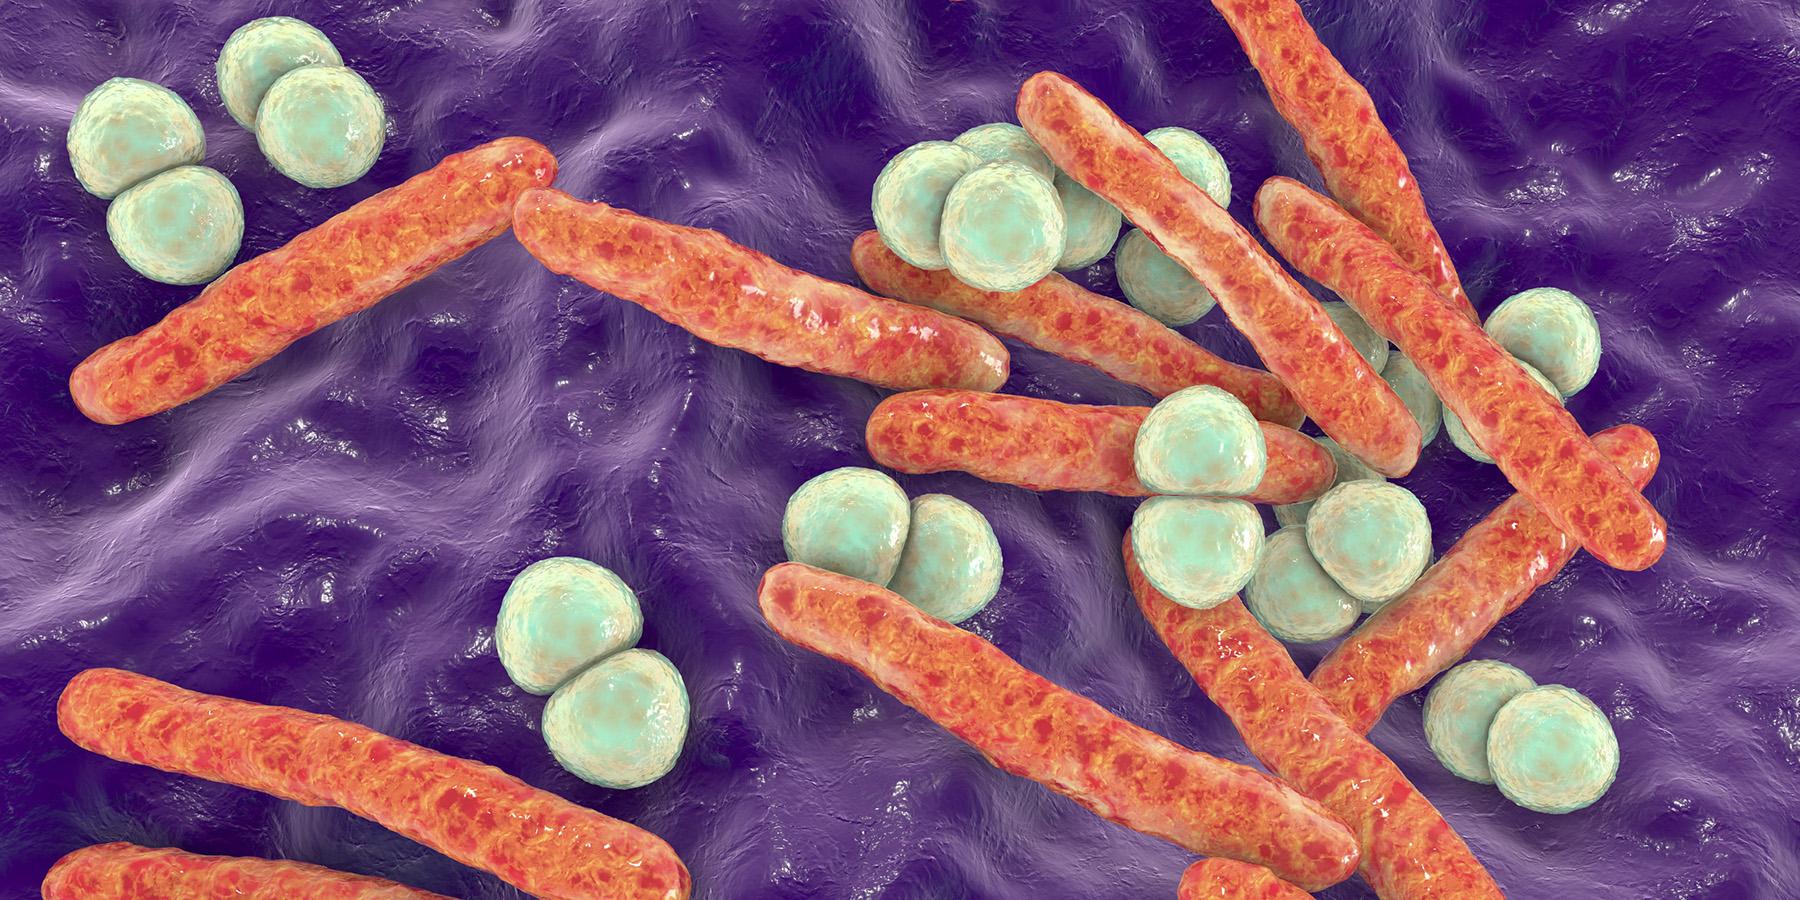 Identifying the Rise of Multidrug Resistant <em>E. coli</em>